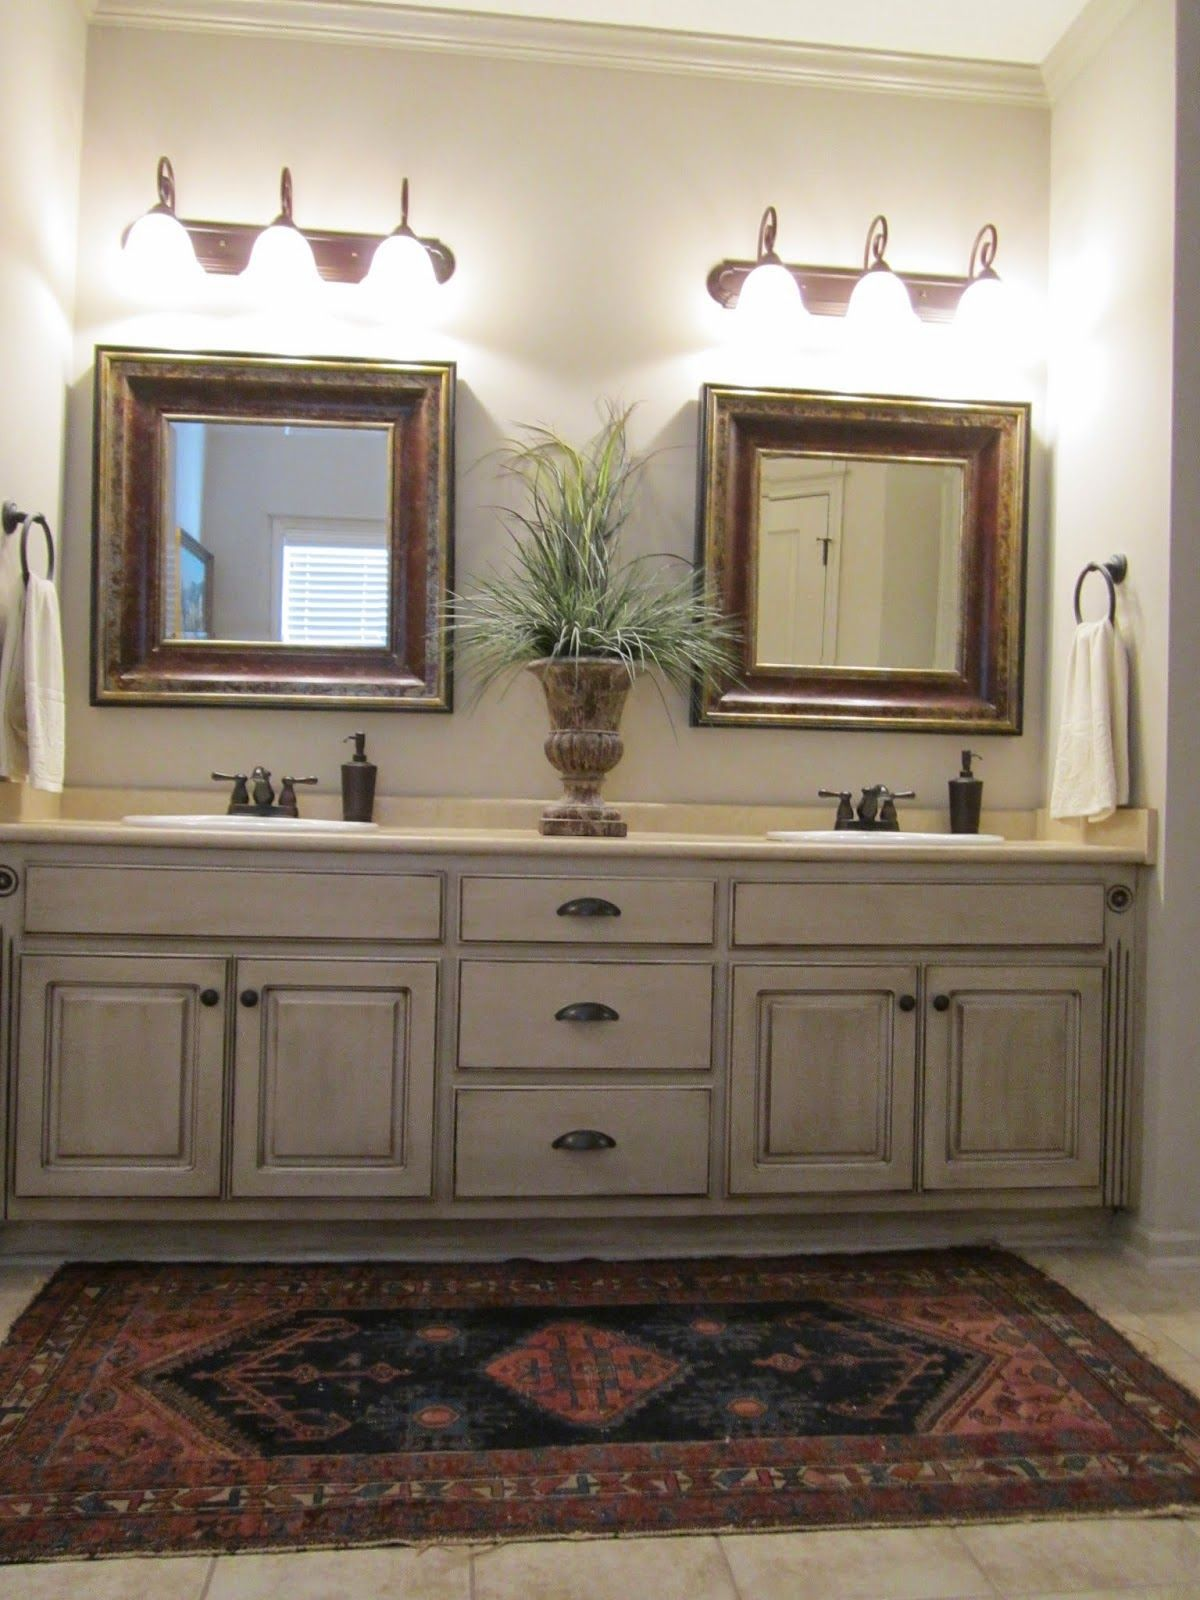 Bathroom Makeovers With Chalk Paint vintage finds: july 2012   bathroom #2 makeover   pinterest